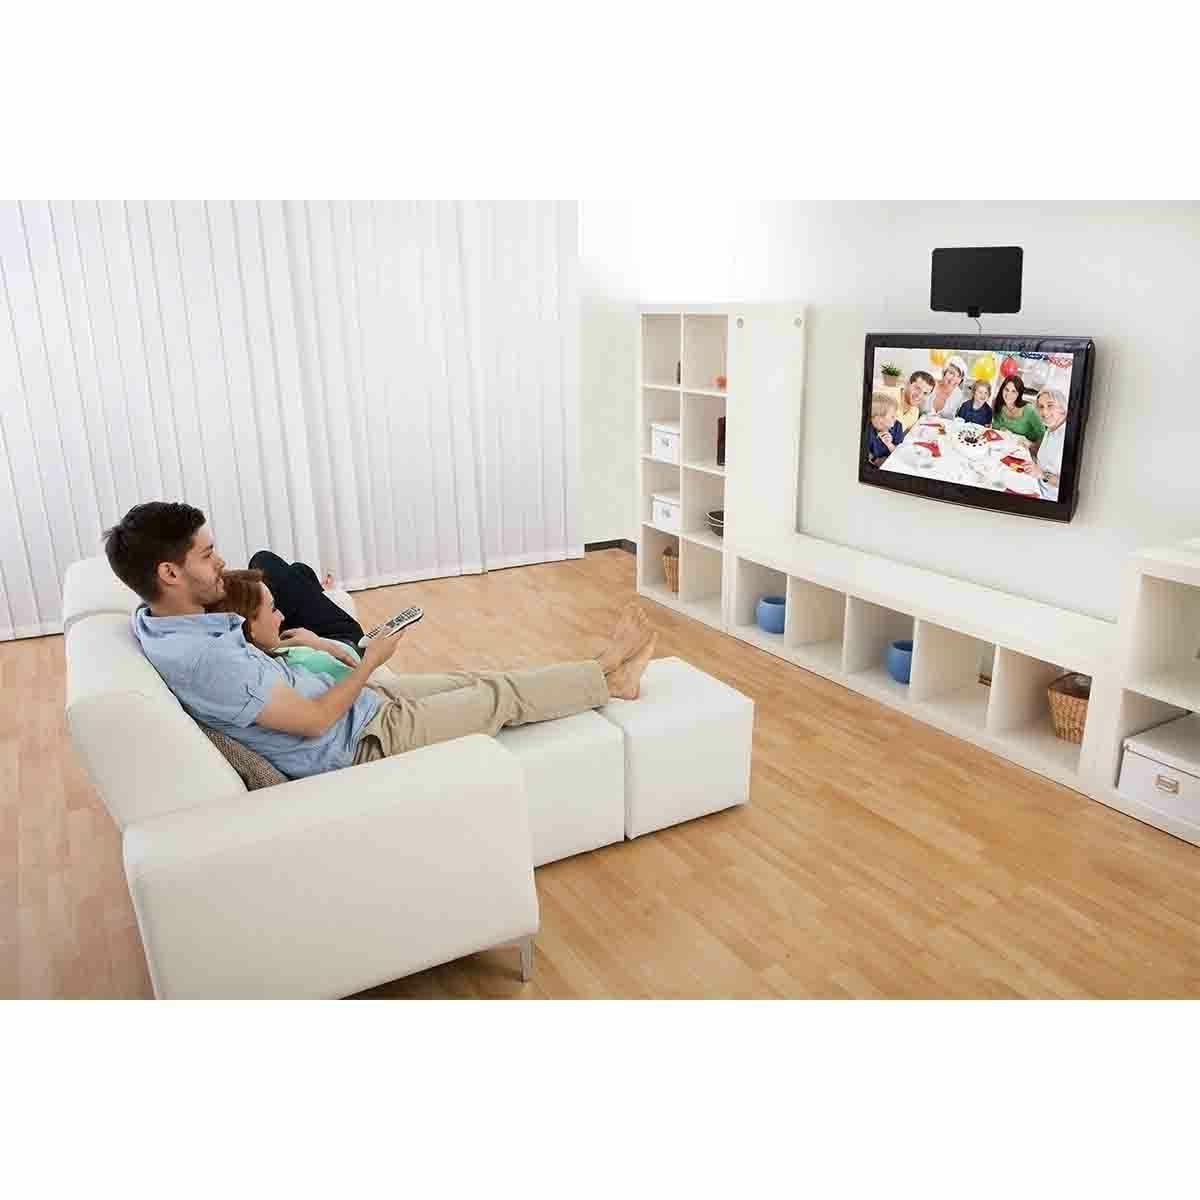 Digital Antenna Miles HDTV Indoor 13ft.